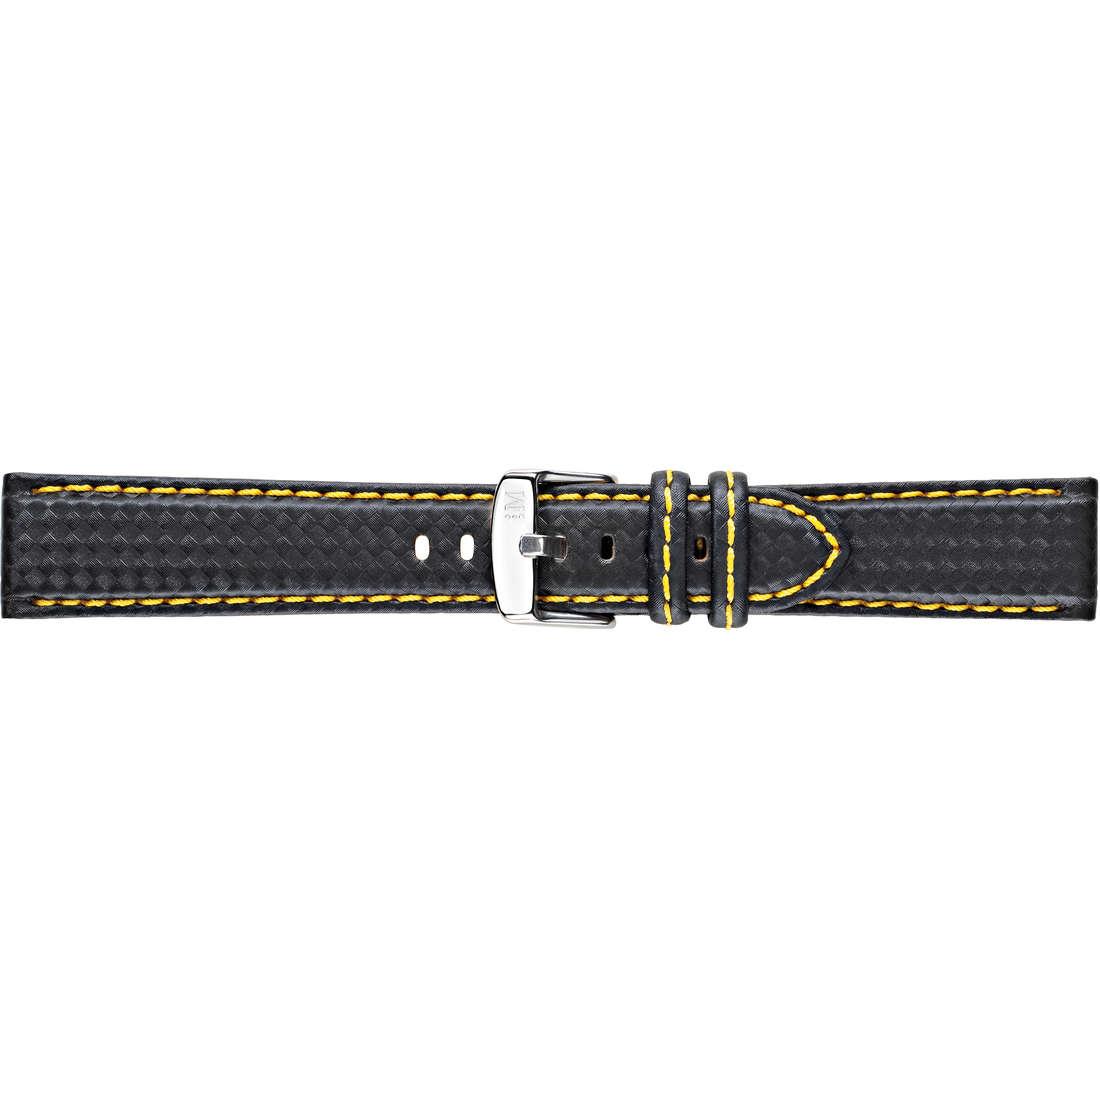 montre bande de montres homme Morellato Linea Sport A01U3586977897CR20